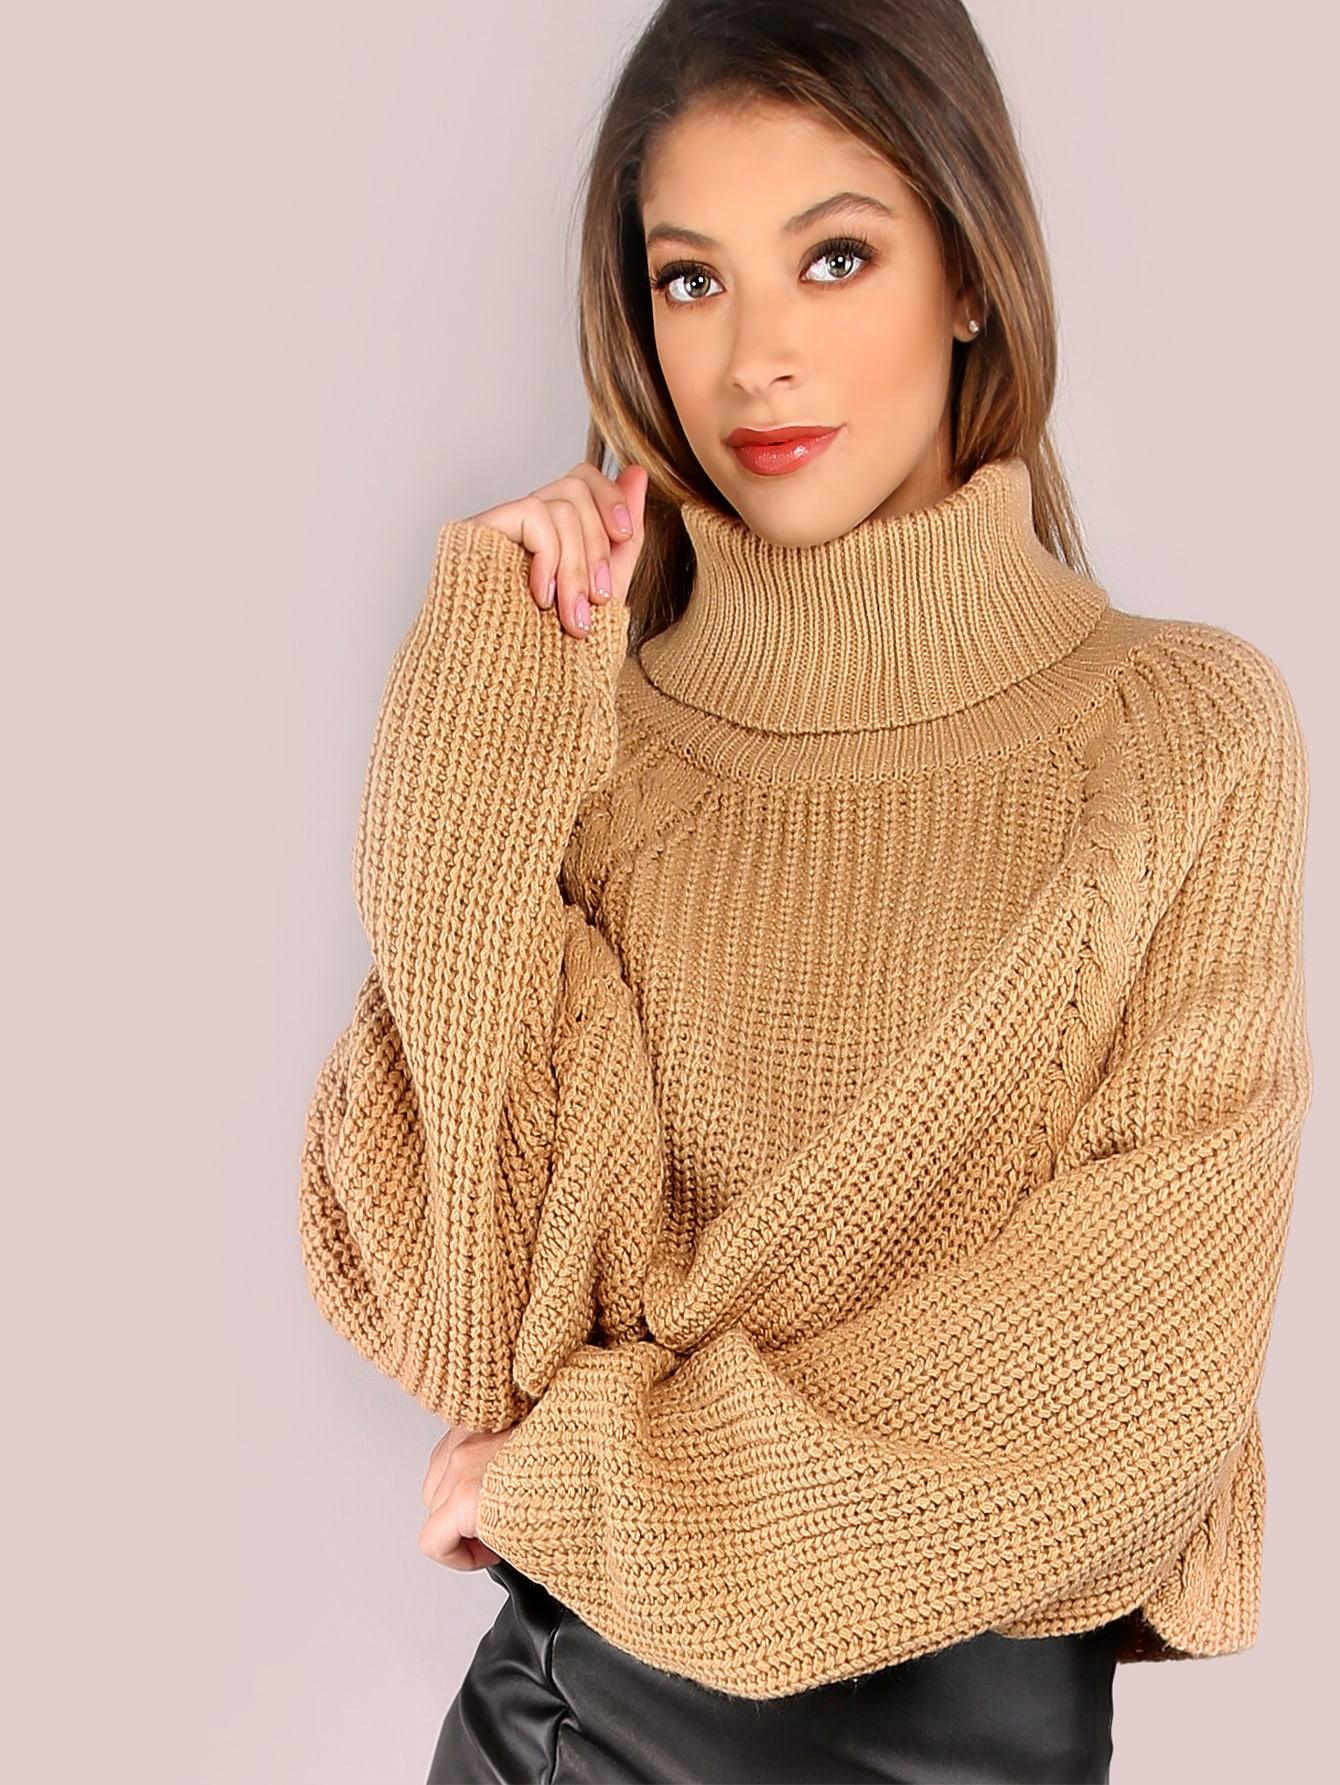 Turtleneck Waffle Knit Crop Sweater CARAMEL -SheIn(Sheinside)